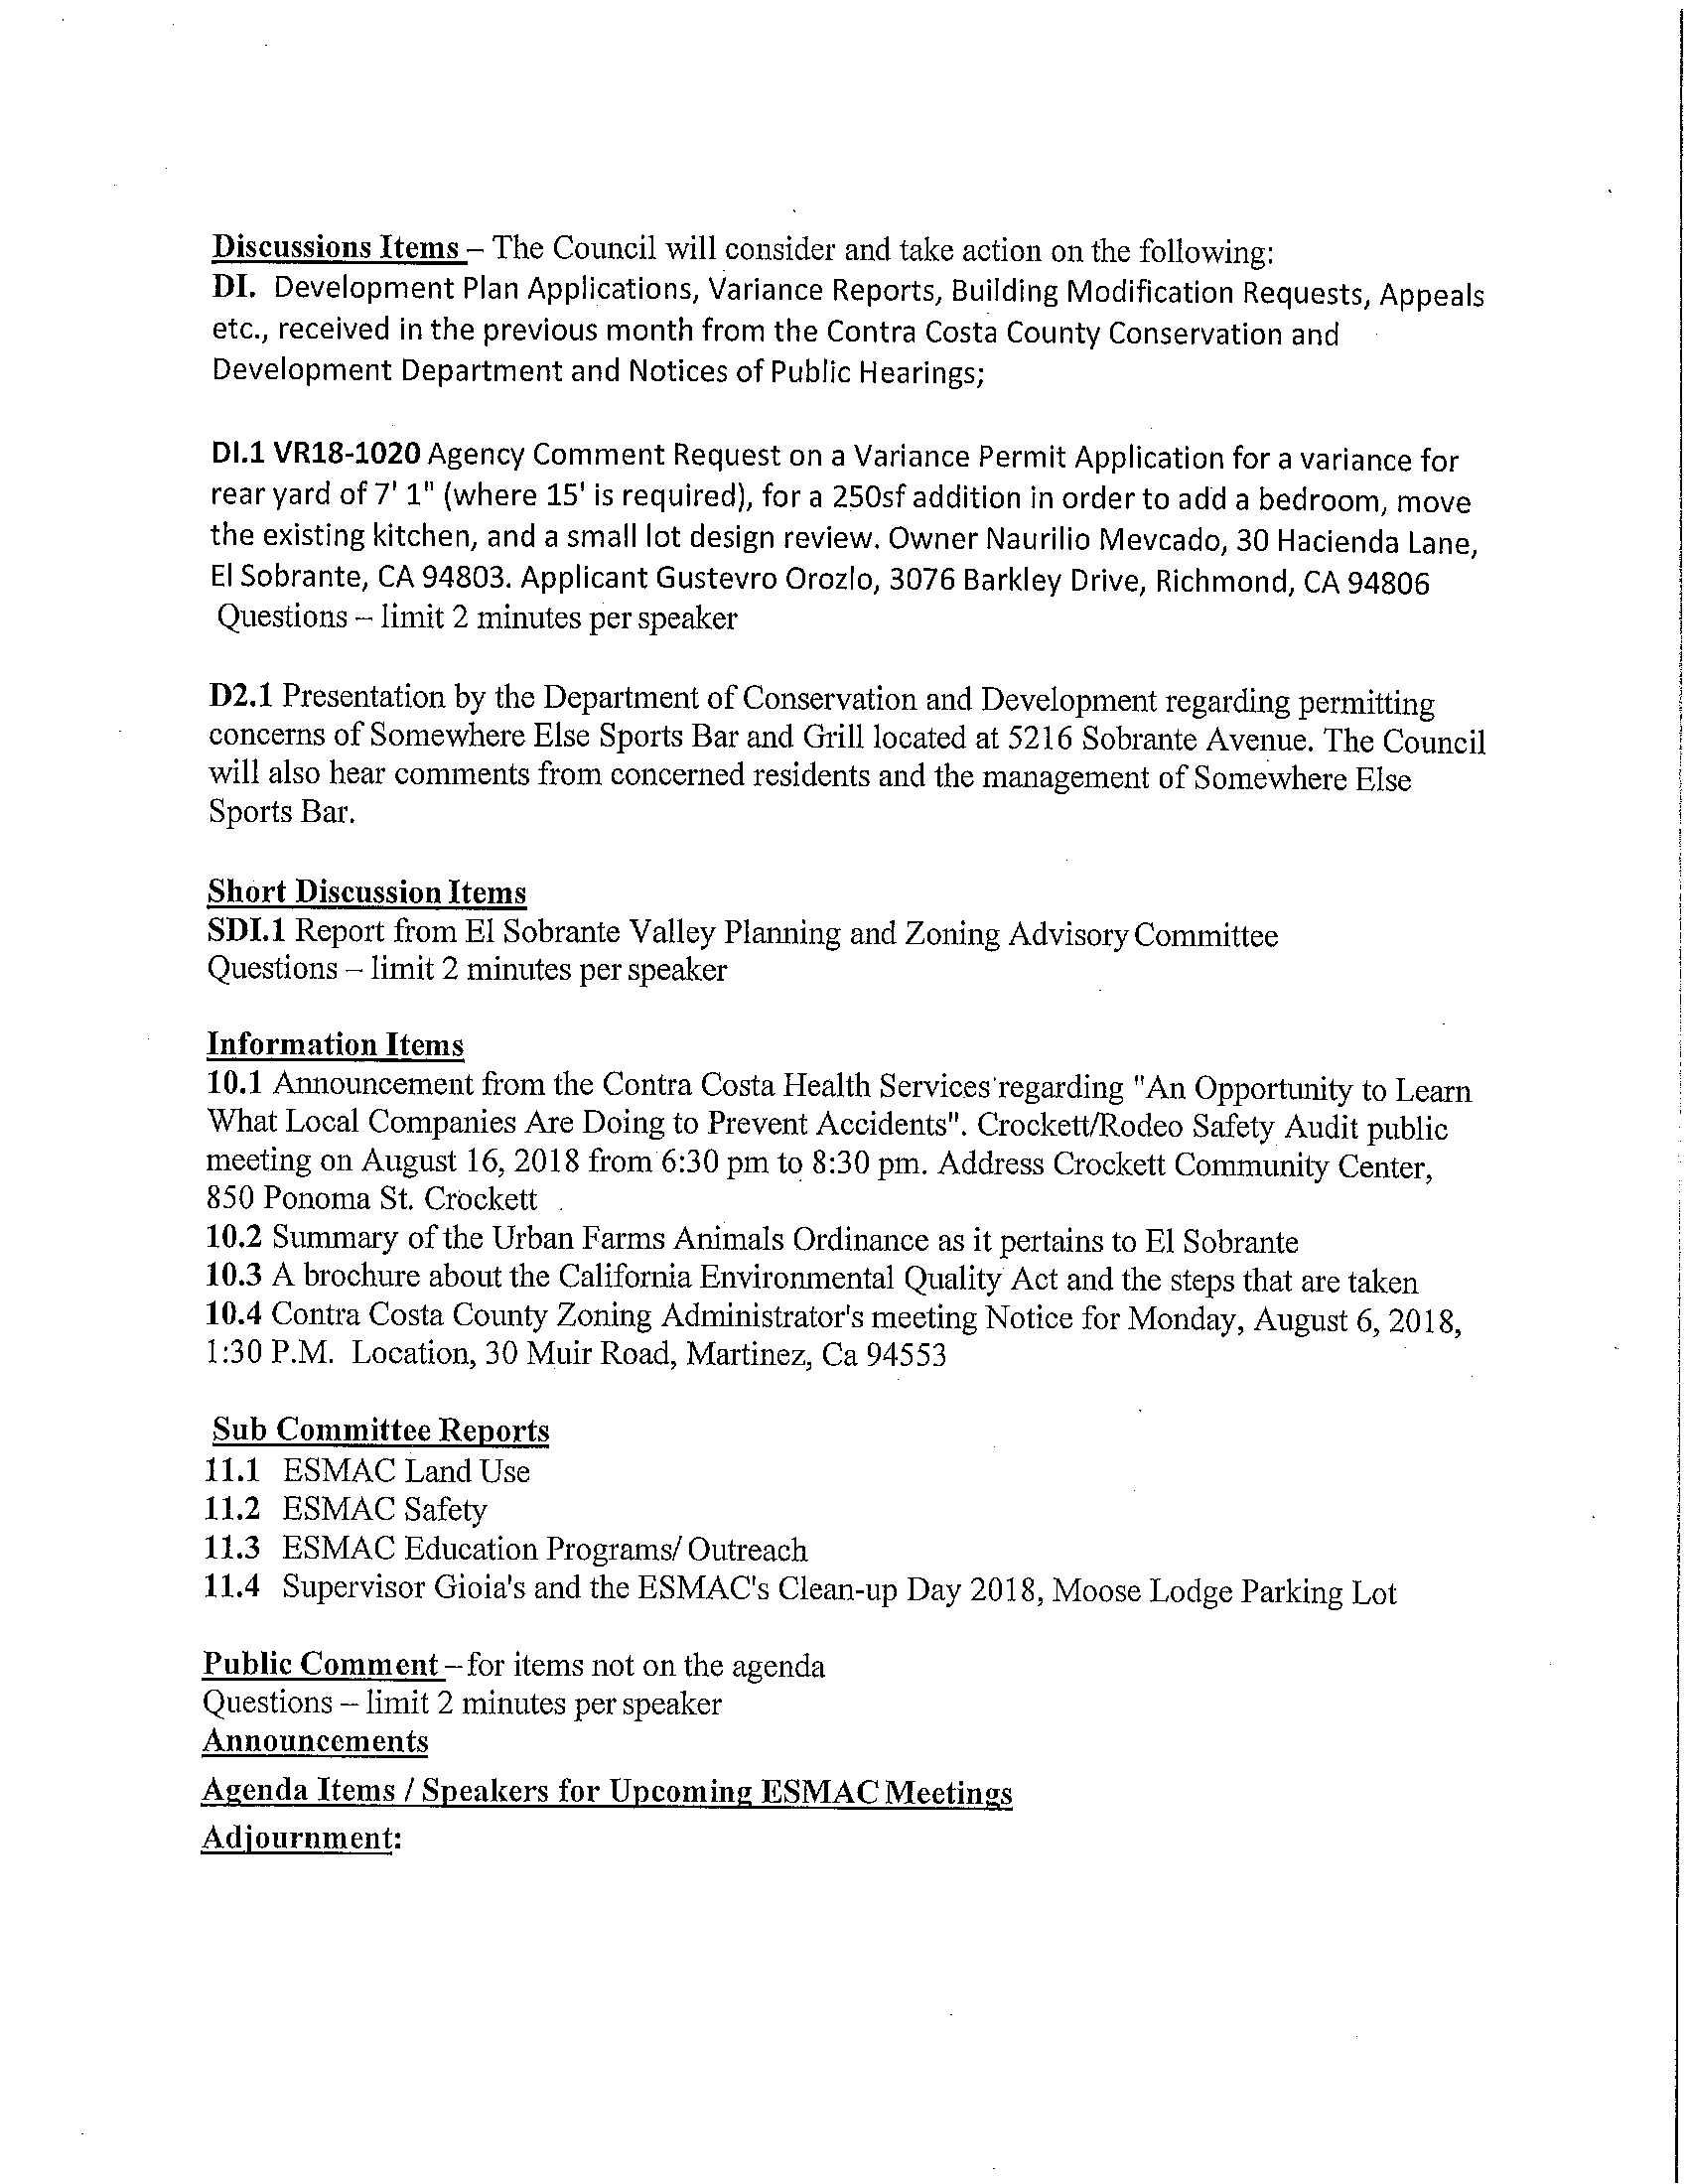 ESMAC Agenda 08.08.2018 (17 Pages)_2.jpg